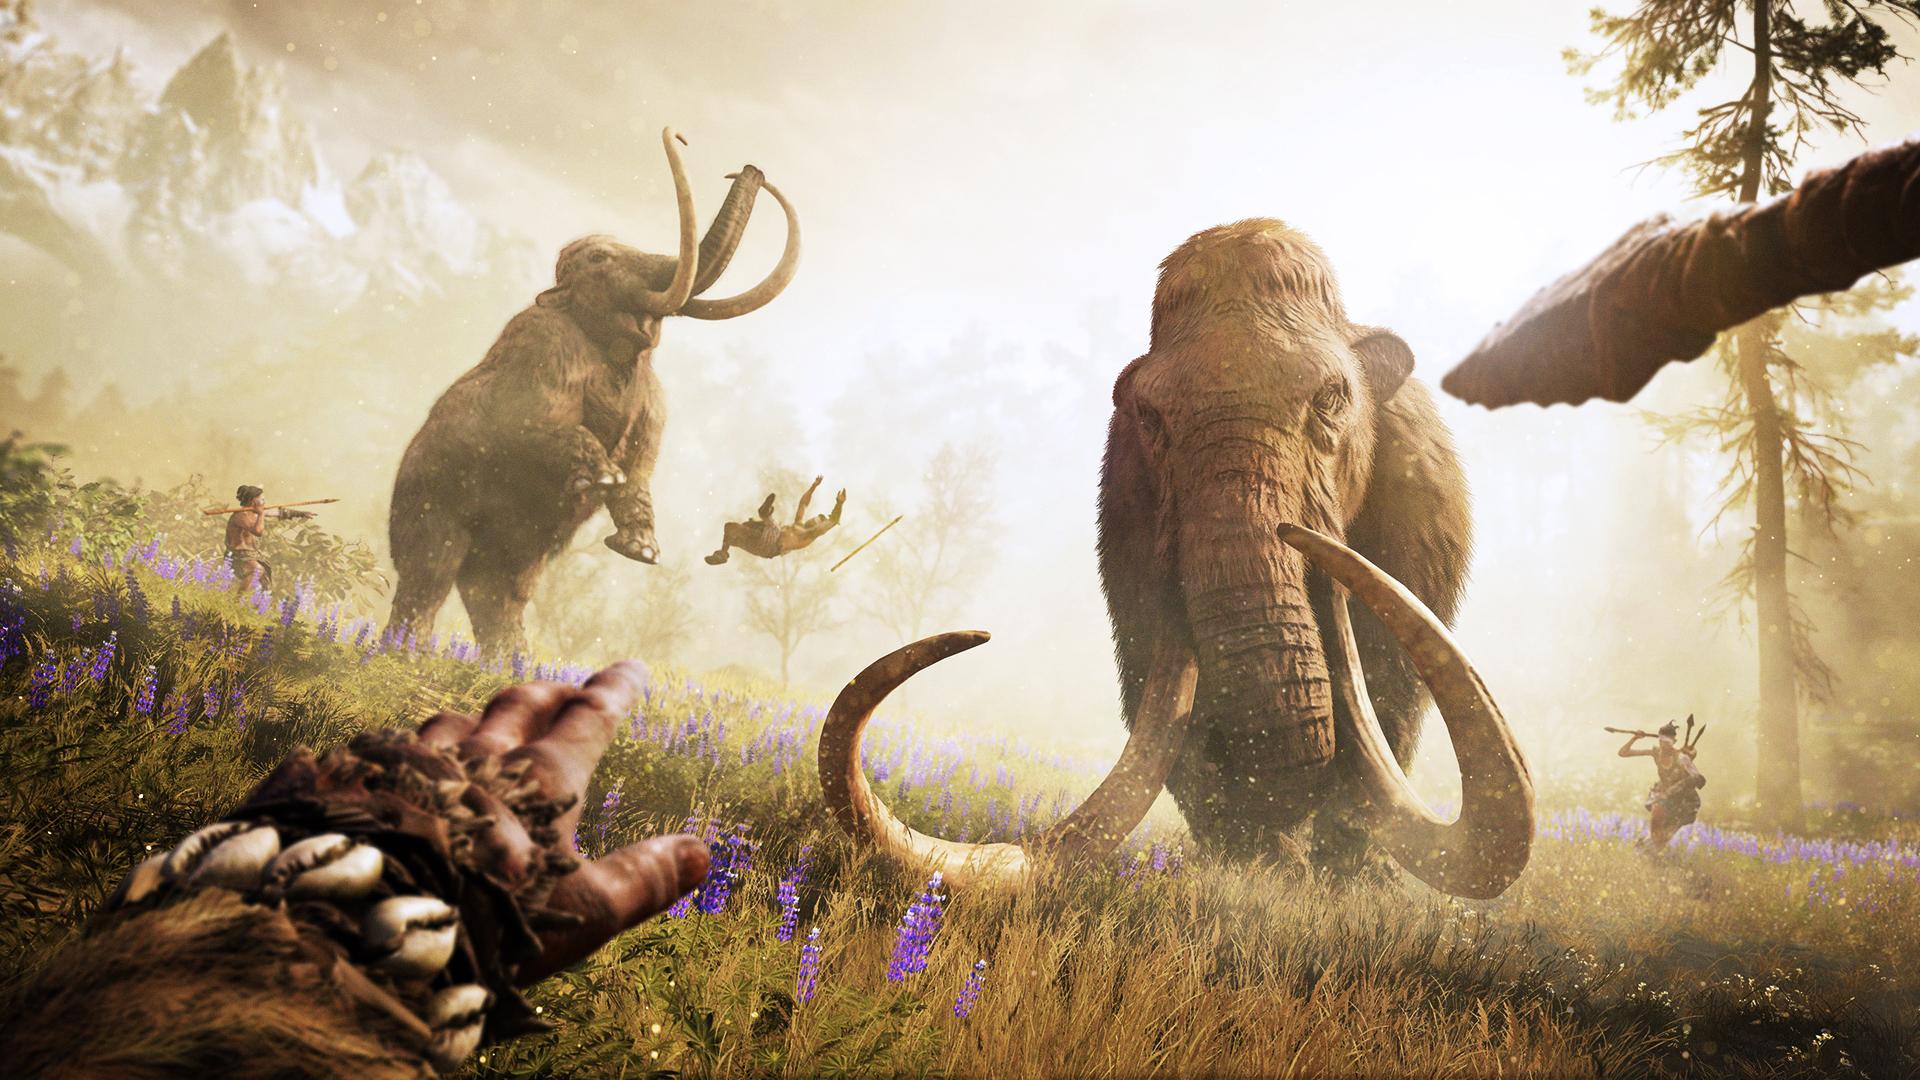 Far Cry Primal Clueless Gamer